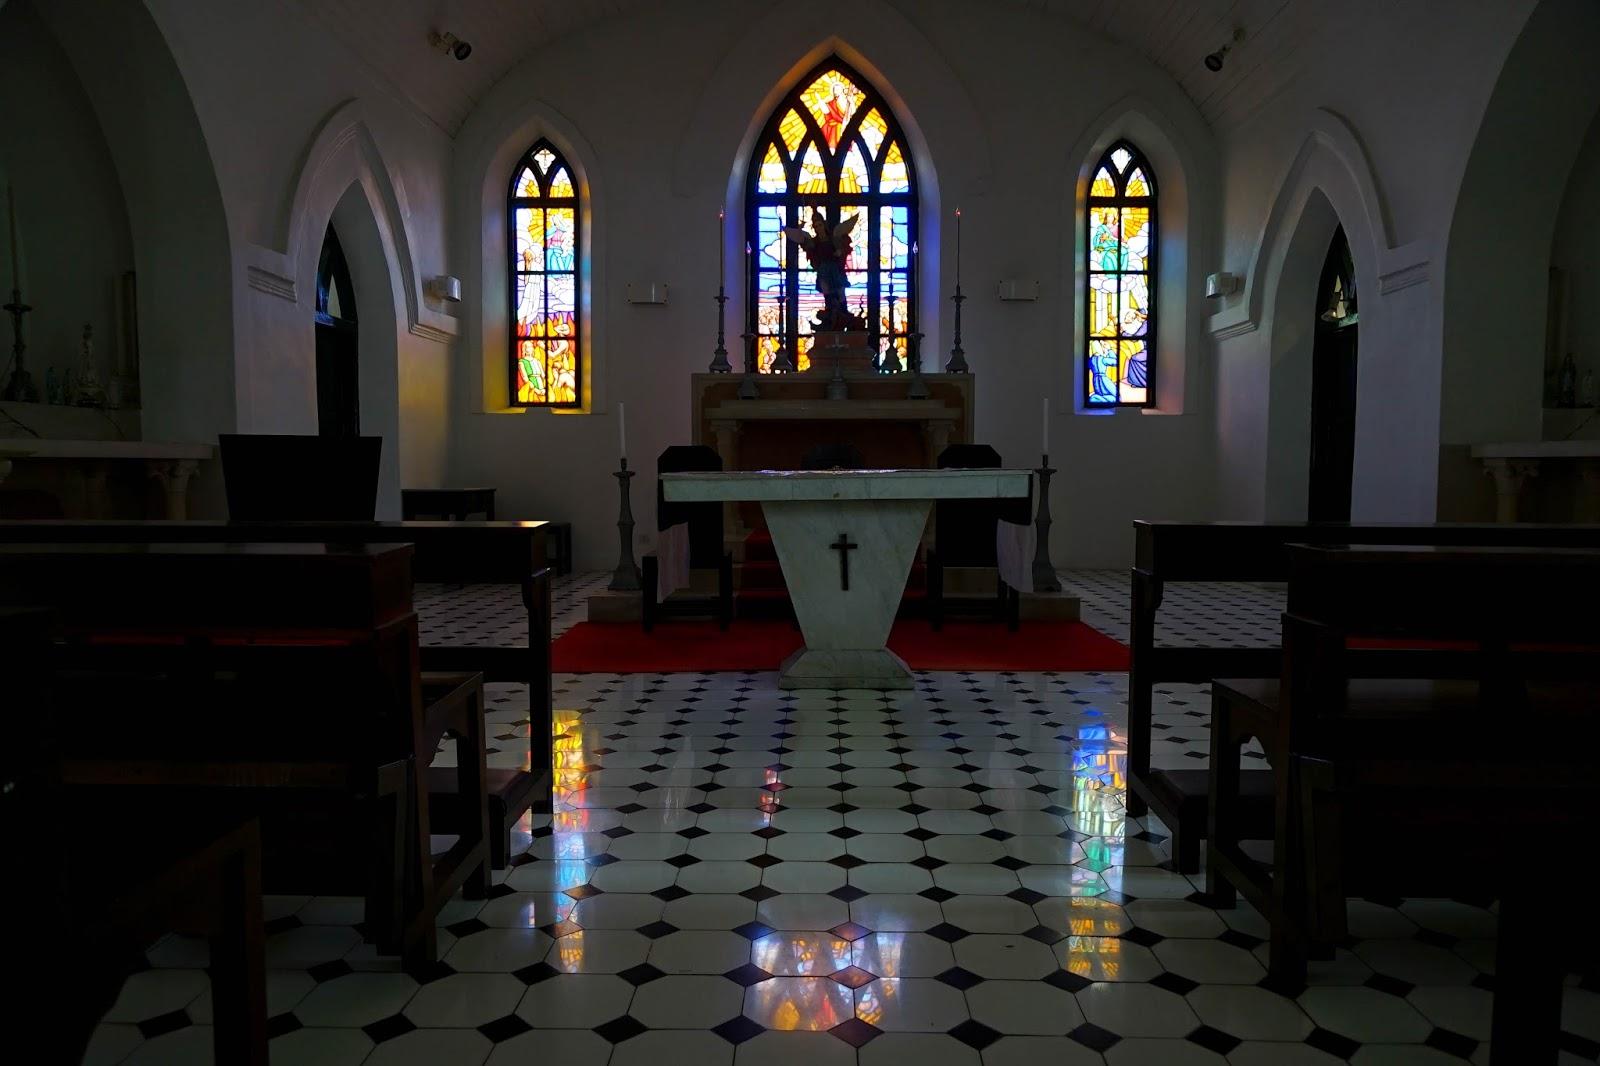 beautyanxiety.com-St. Michael's Chapel and Cemetery-beautyanxiety.com-St.%2BMichael%2527s%2BChapel%2Band%2BCemetery-DSC09998.jpg